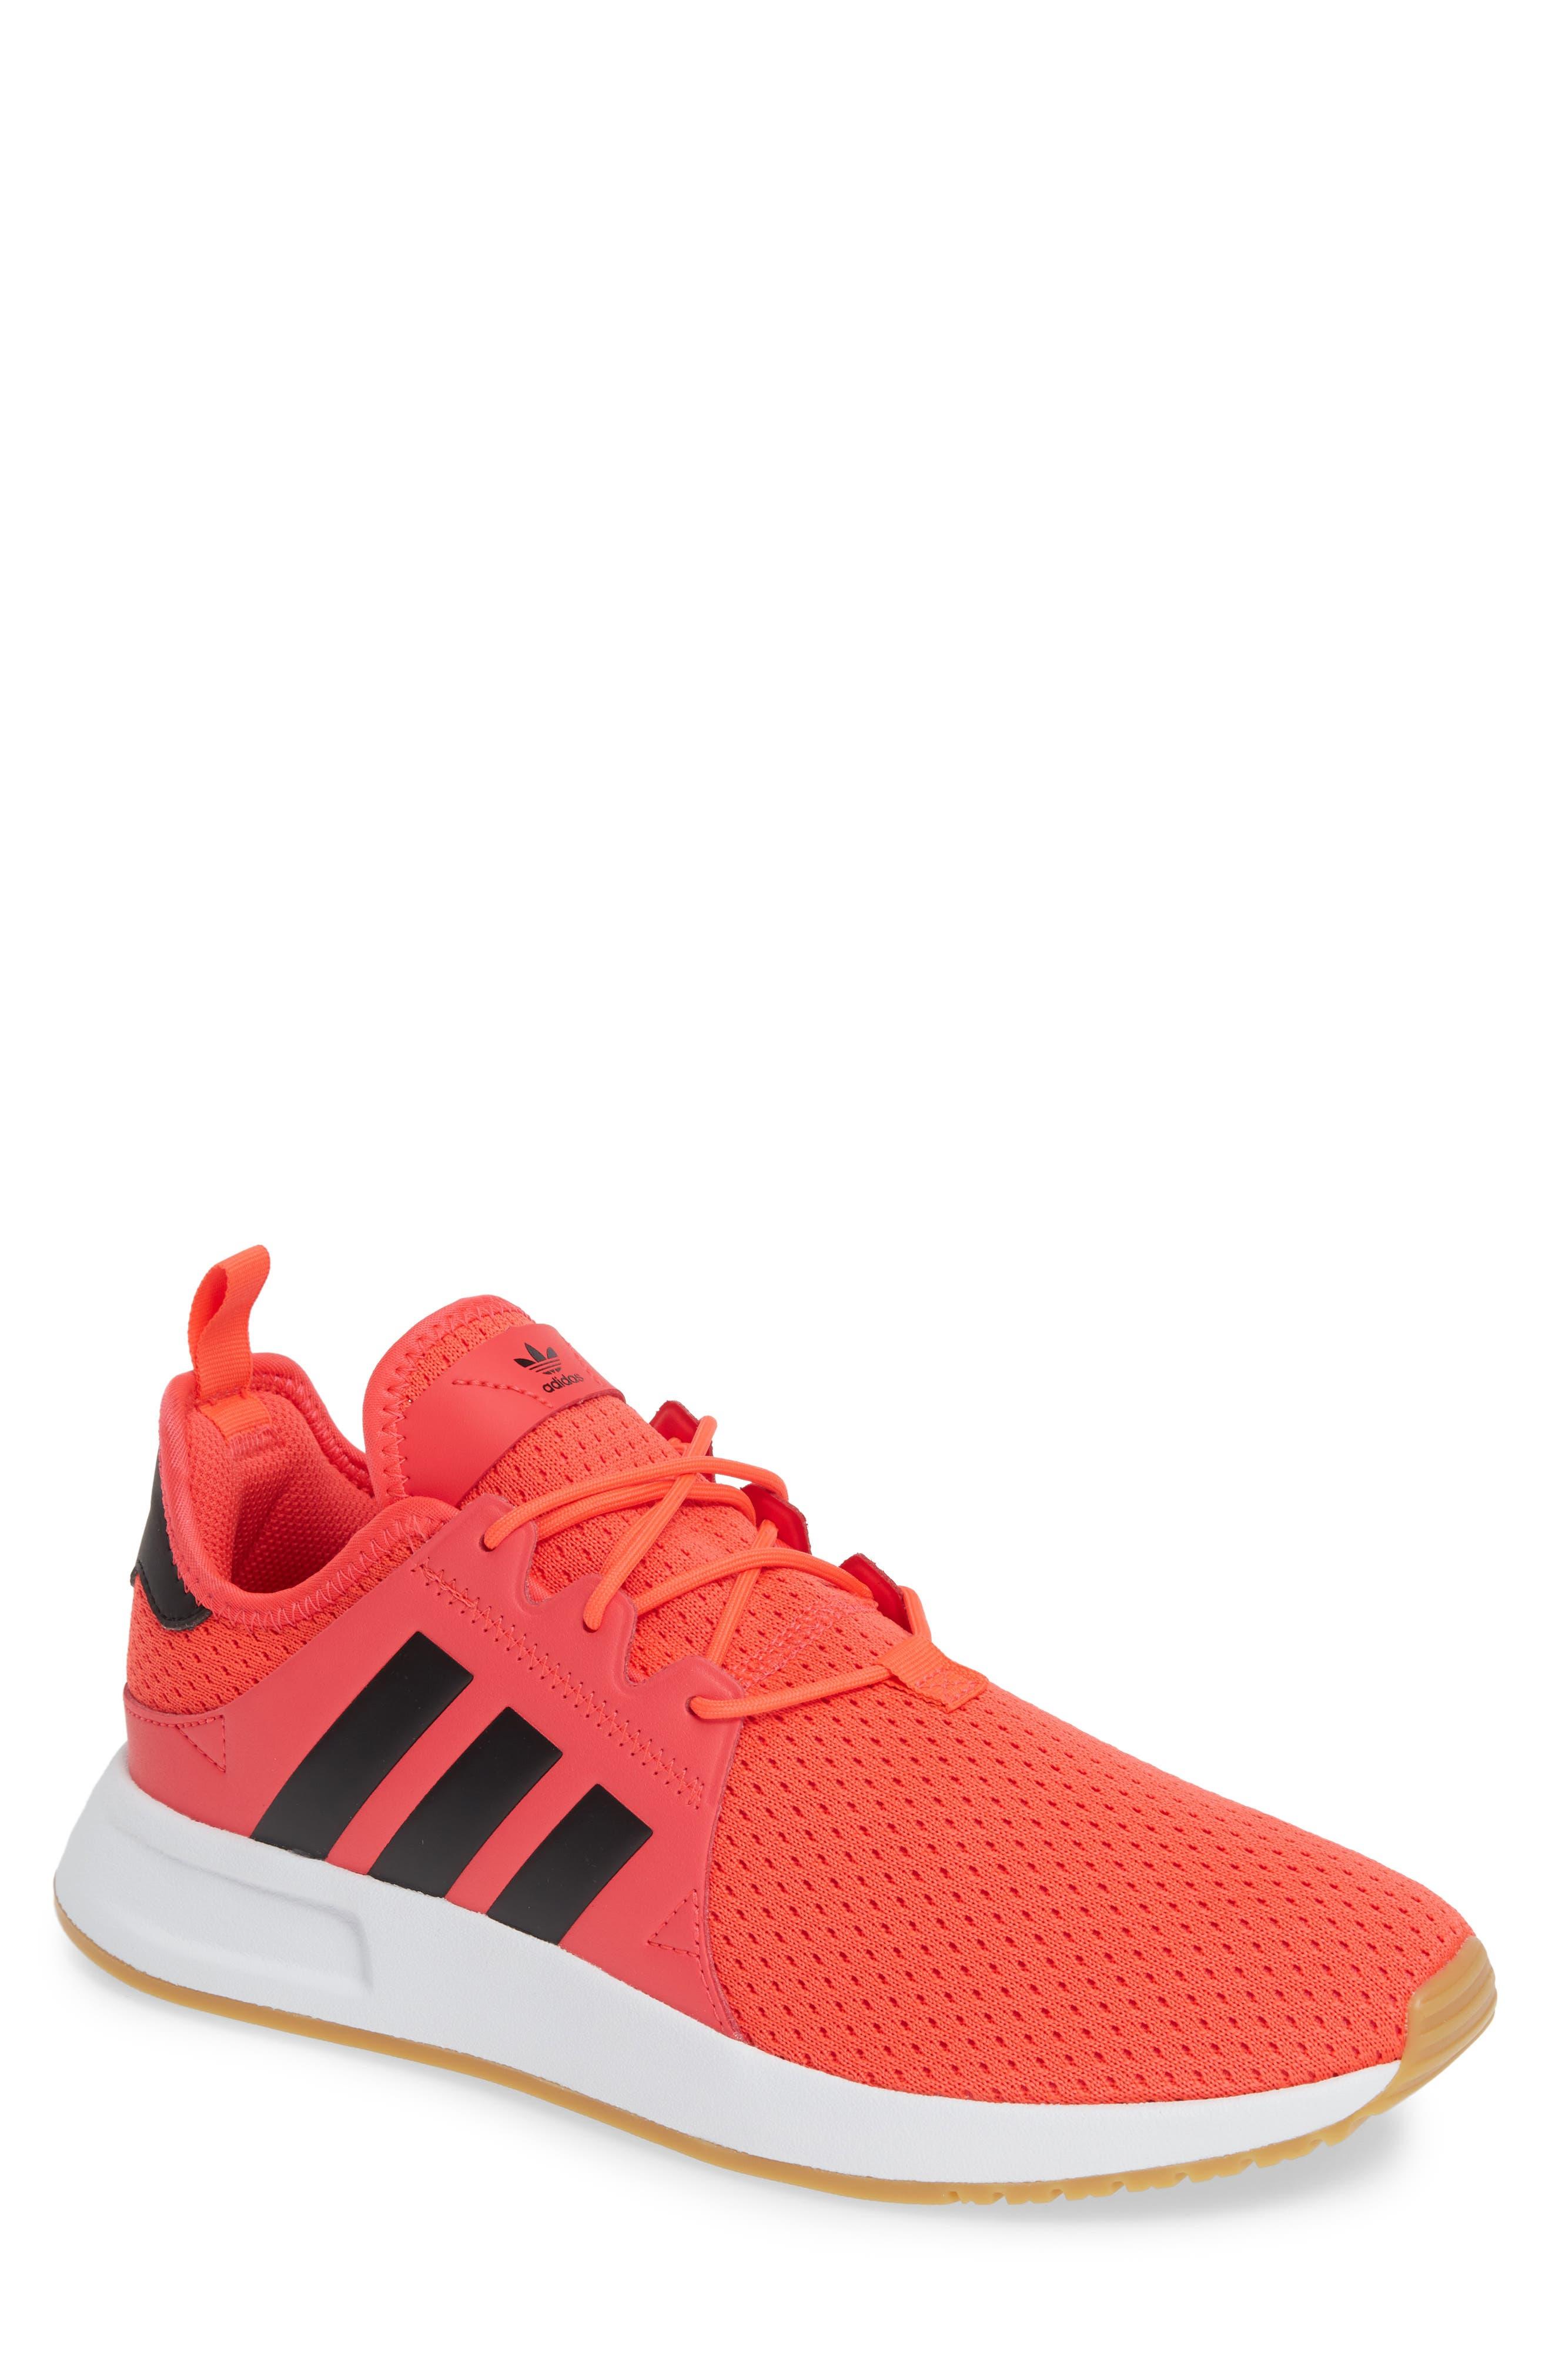 X_PLR Sneaker, Main, color, SHOCK RED/ CORE BLACK/ WHITE